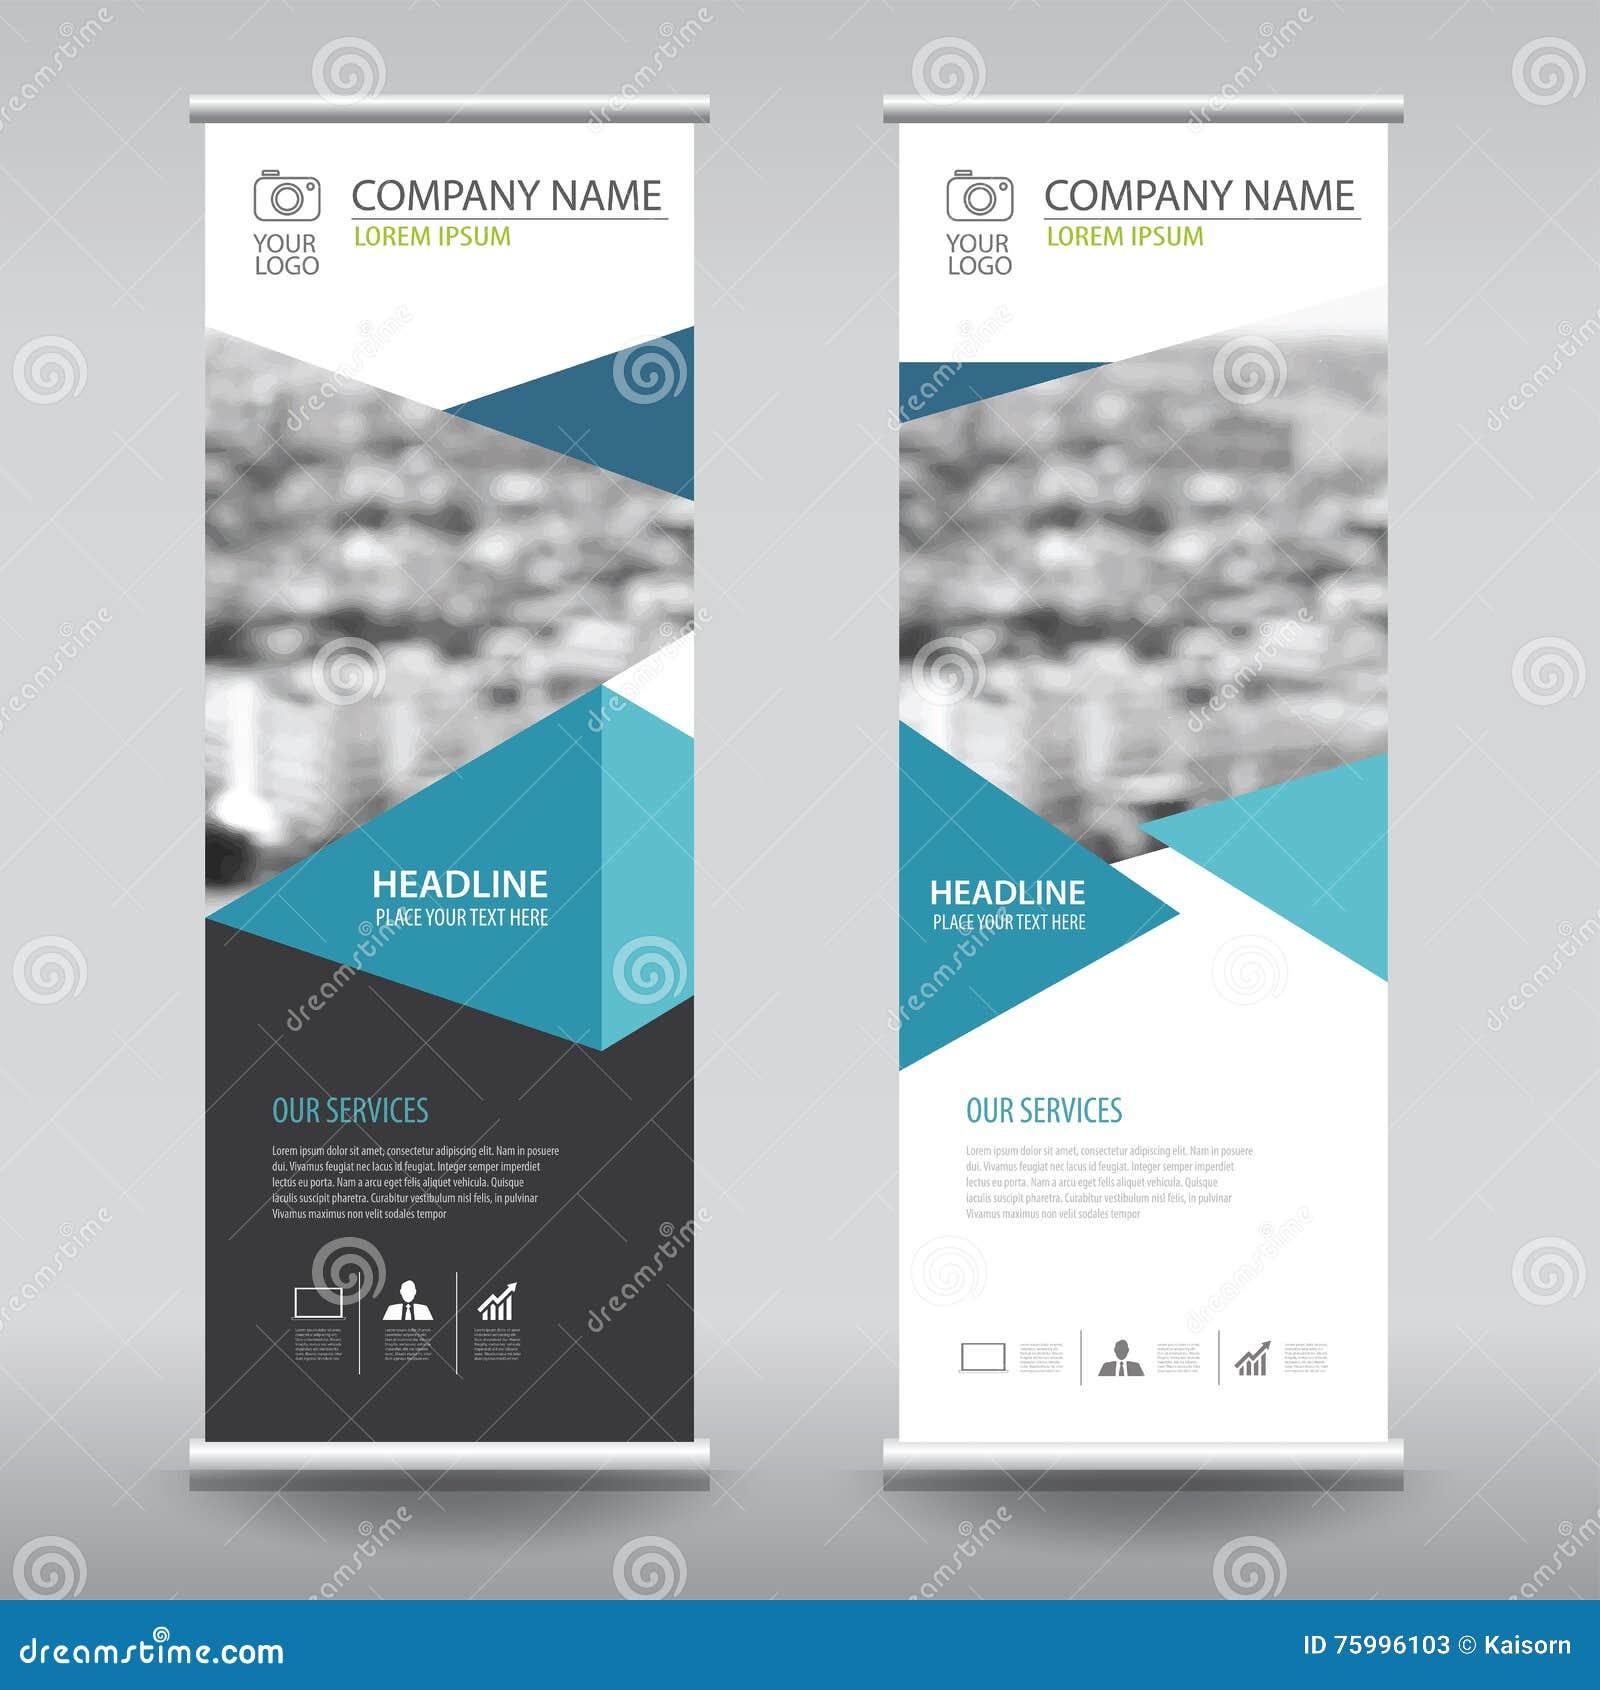 Green roll up business brochure flyer banner design vertical template - Roll Up Business Brochure Flyer Banner Design Vertical Template Stock Photos